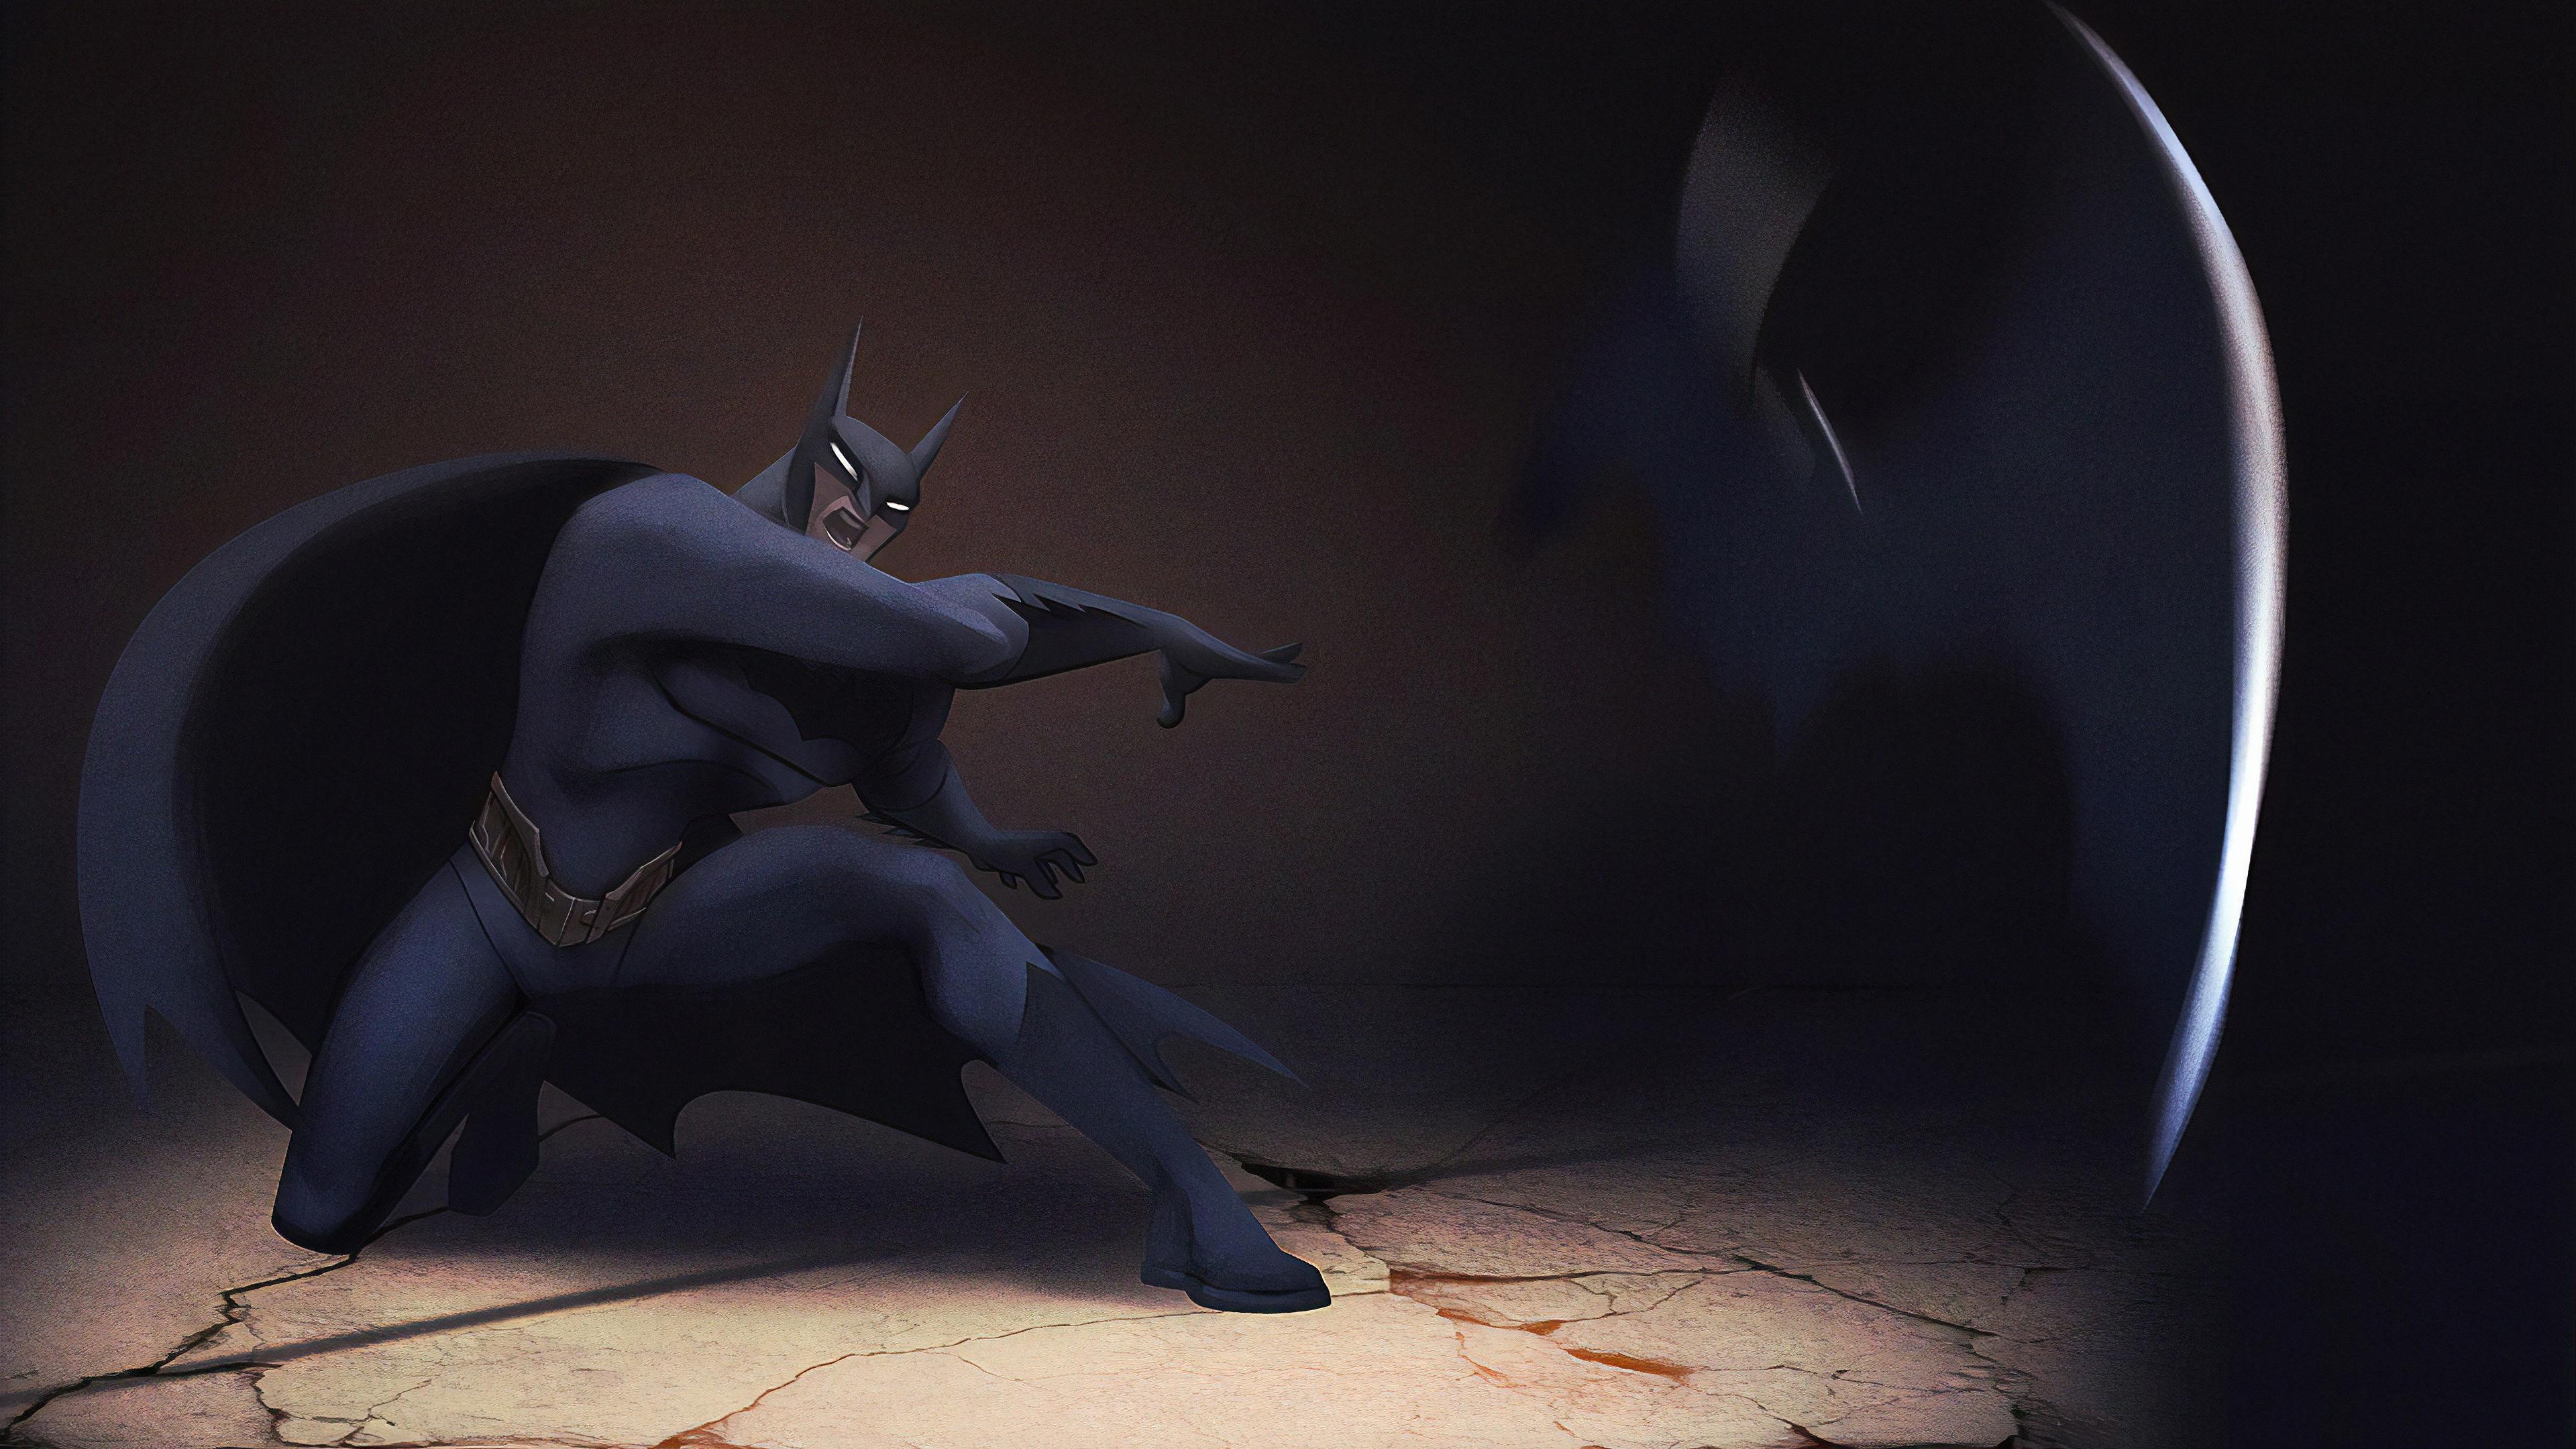 batman throwing bat signal 1569186641 - Batman Throwing Bat Signal - superheroes wallpapers, hd-wallpapers, digital art wallpapers, deviantart wallpapers, batman wallpapers, artwork wallpapers, 4k-wallpapers